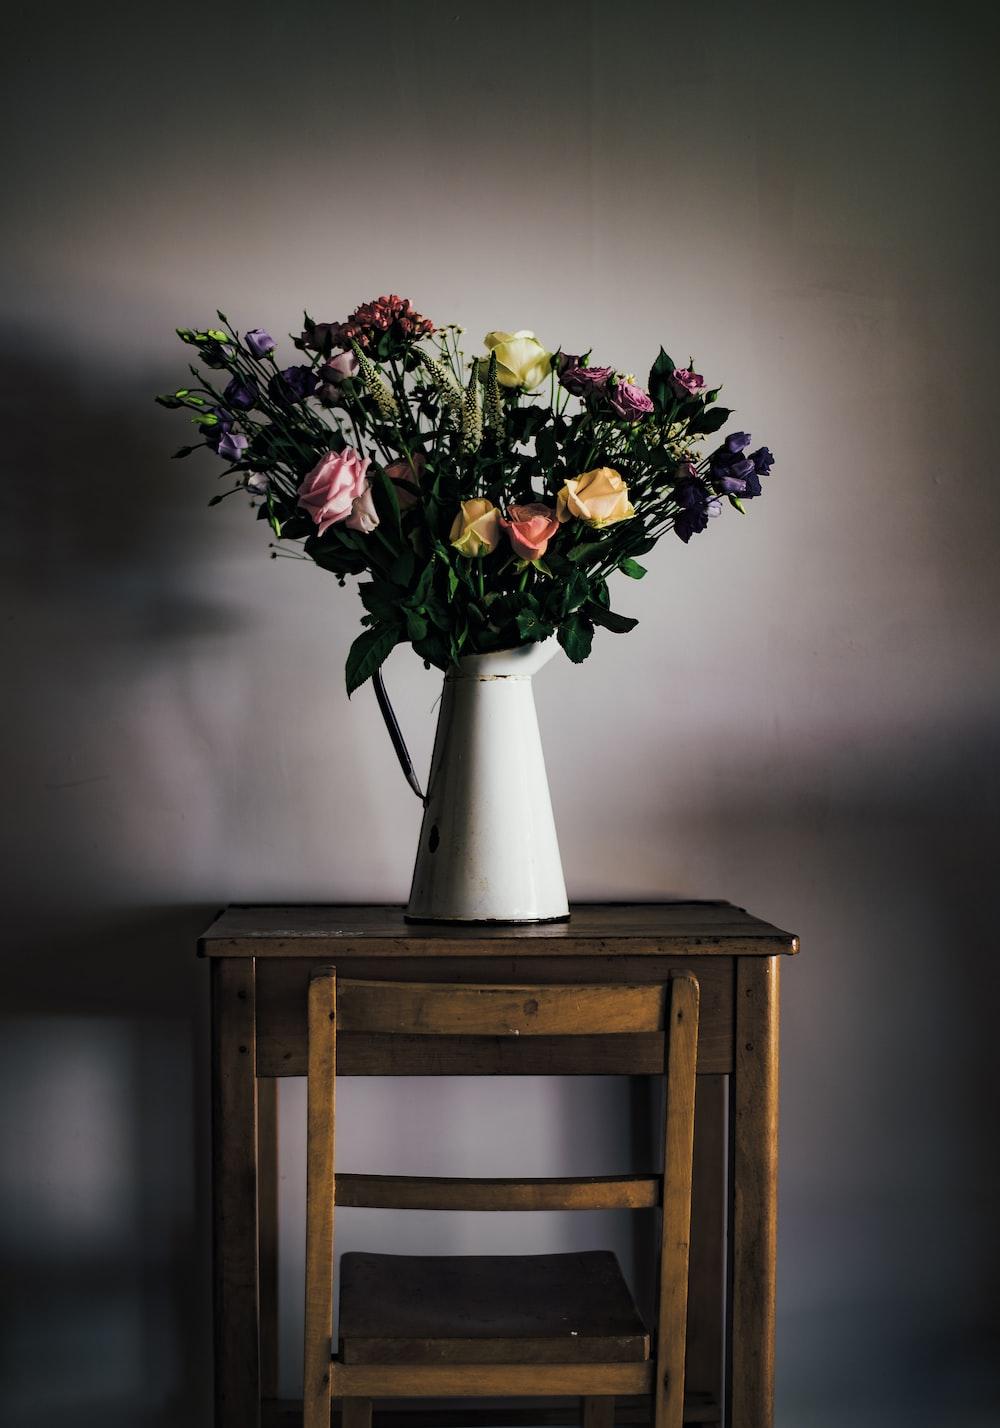 flower arrangement in white vase